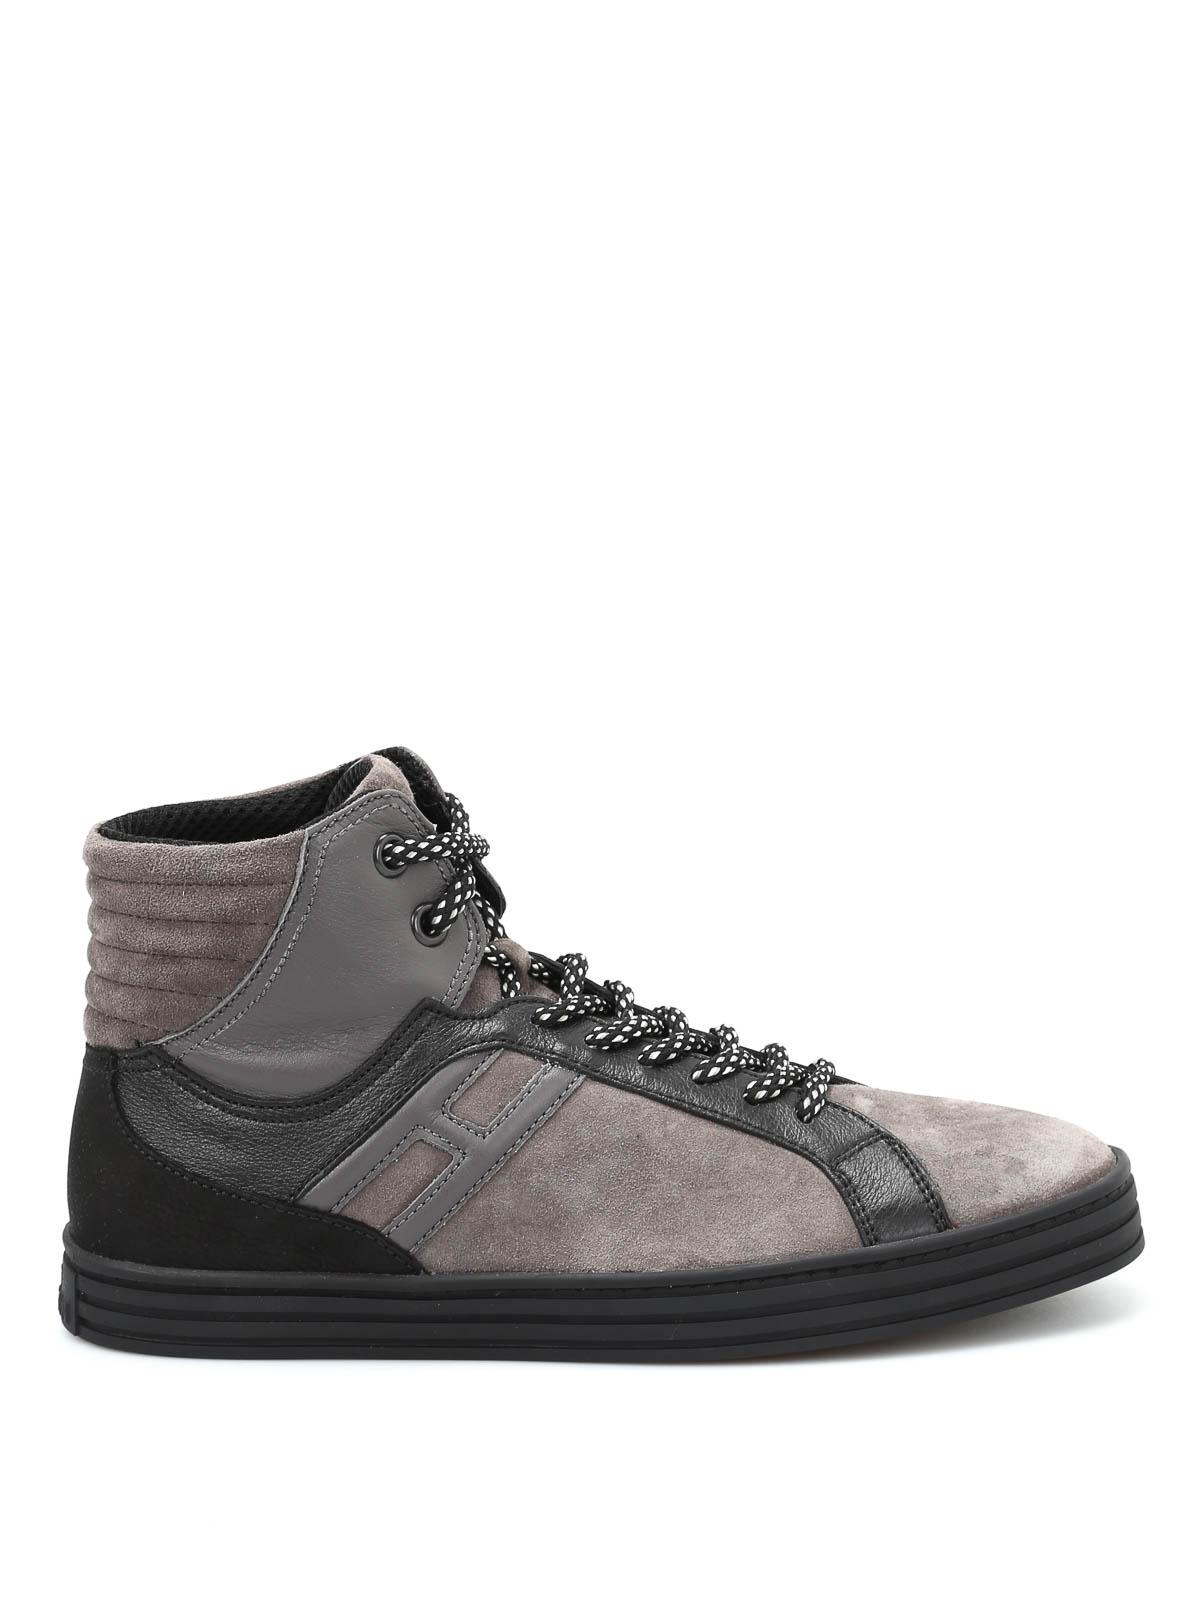 r141 high top basket sneakers by hogan rebel trainers ikrix. Black Bedroom Furniture Sets. Home Design Ideas